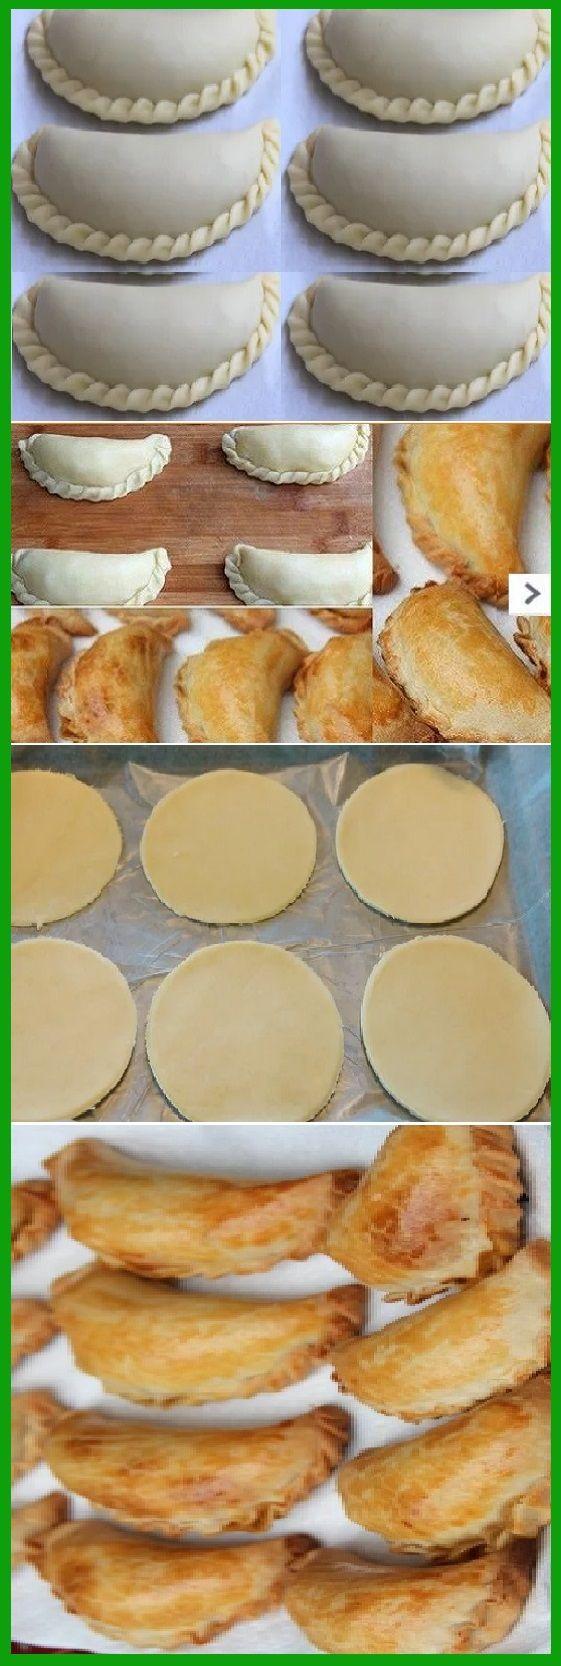 Les comparto la mejor MASA CASERA: para Empanadas de Horno receta fácil para preparar.  #preparar #facil #masa #empanadas #dehorno #lamejor  #receta #recipe #casero #torta #tartas #pastel #nestlecocina #bizcocho #bizcochuelo #tasty #cocina #chocolate   Si te gusta dinos HOLA y dale a Me Gusta MIREN…